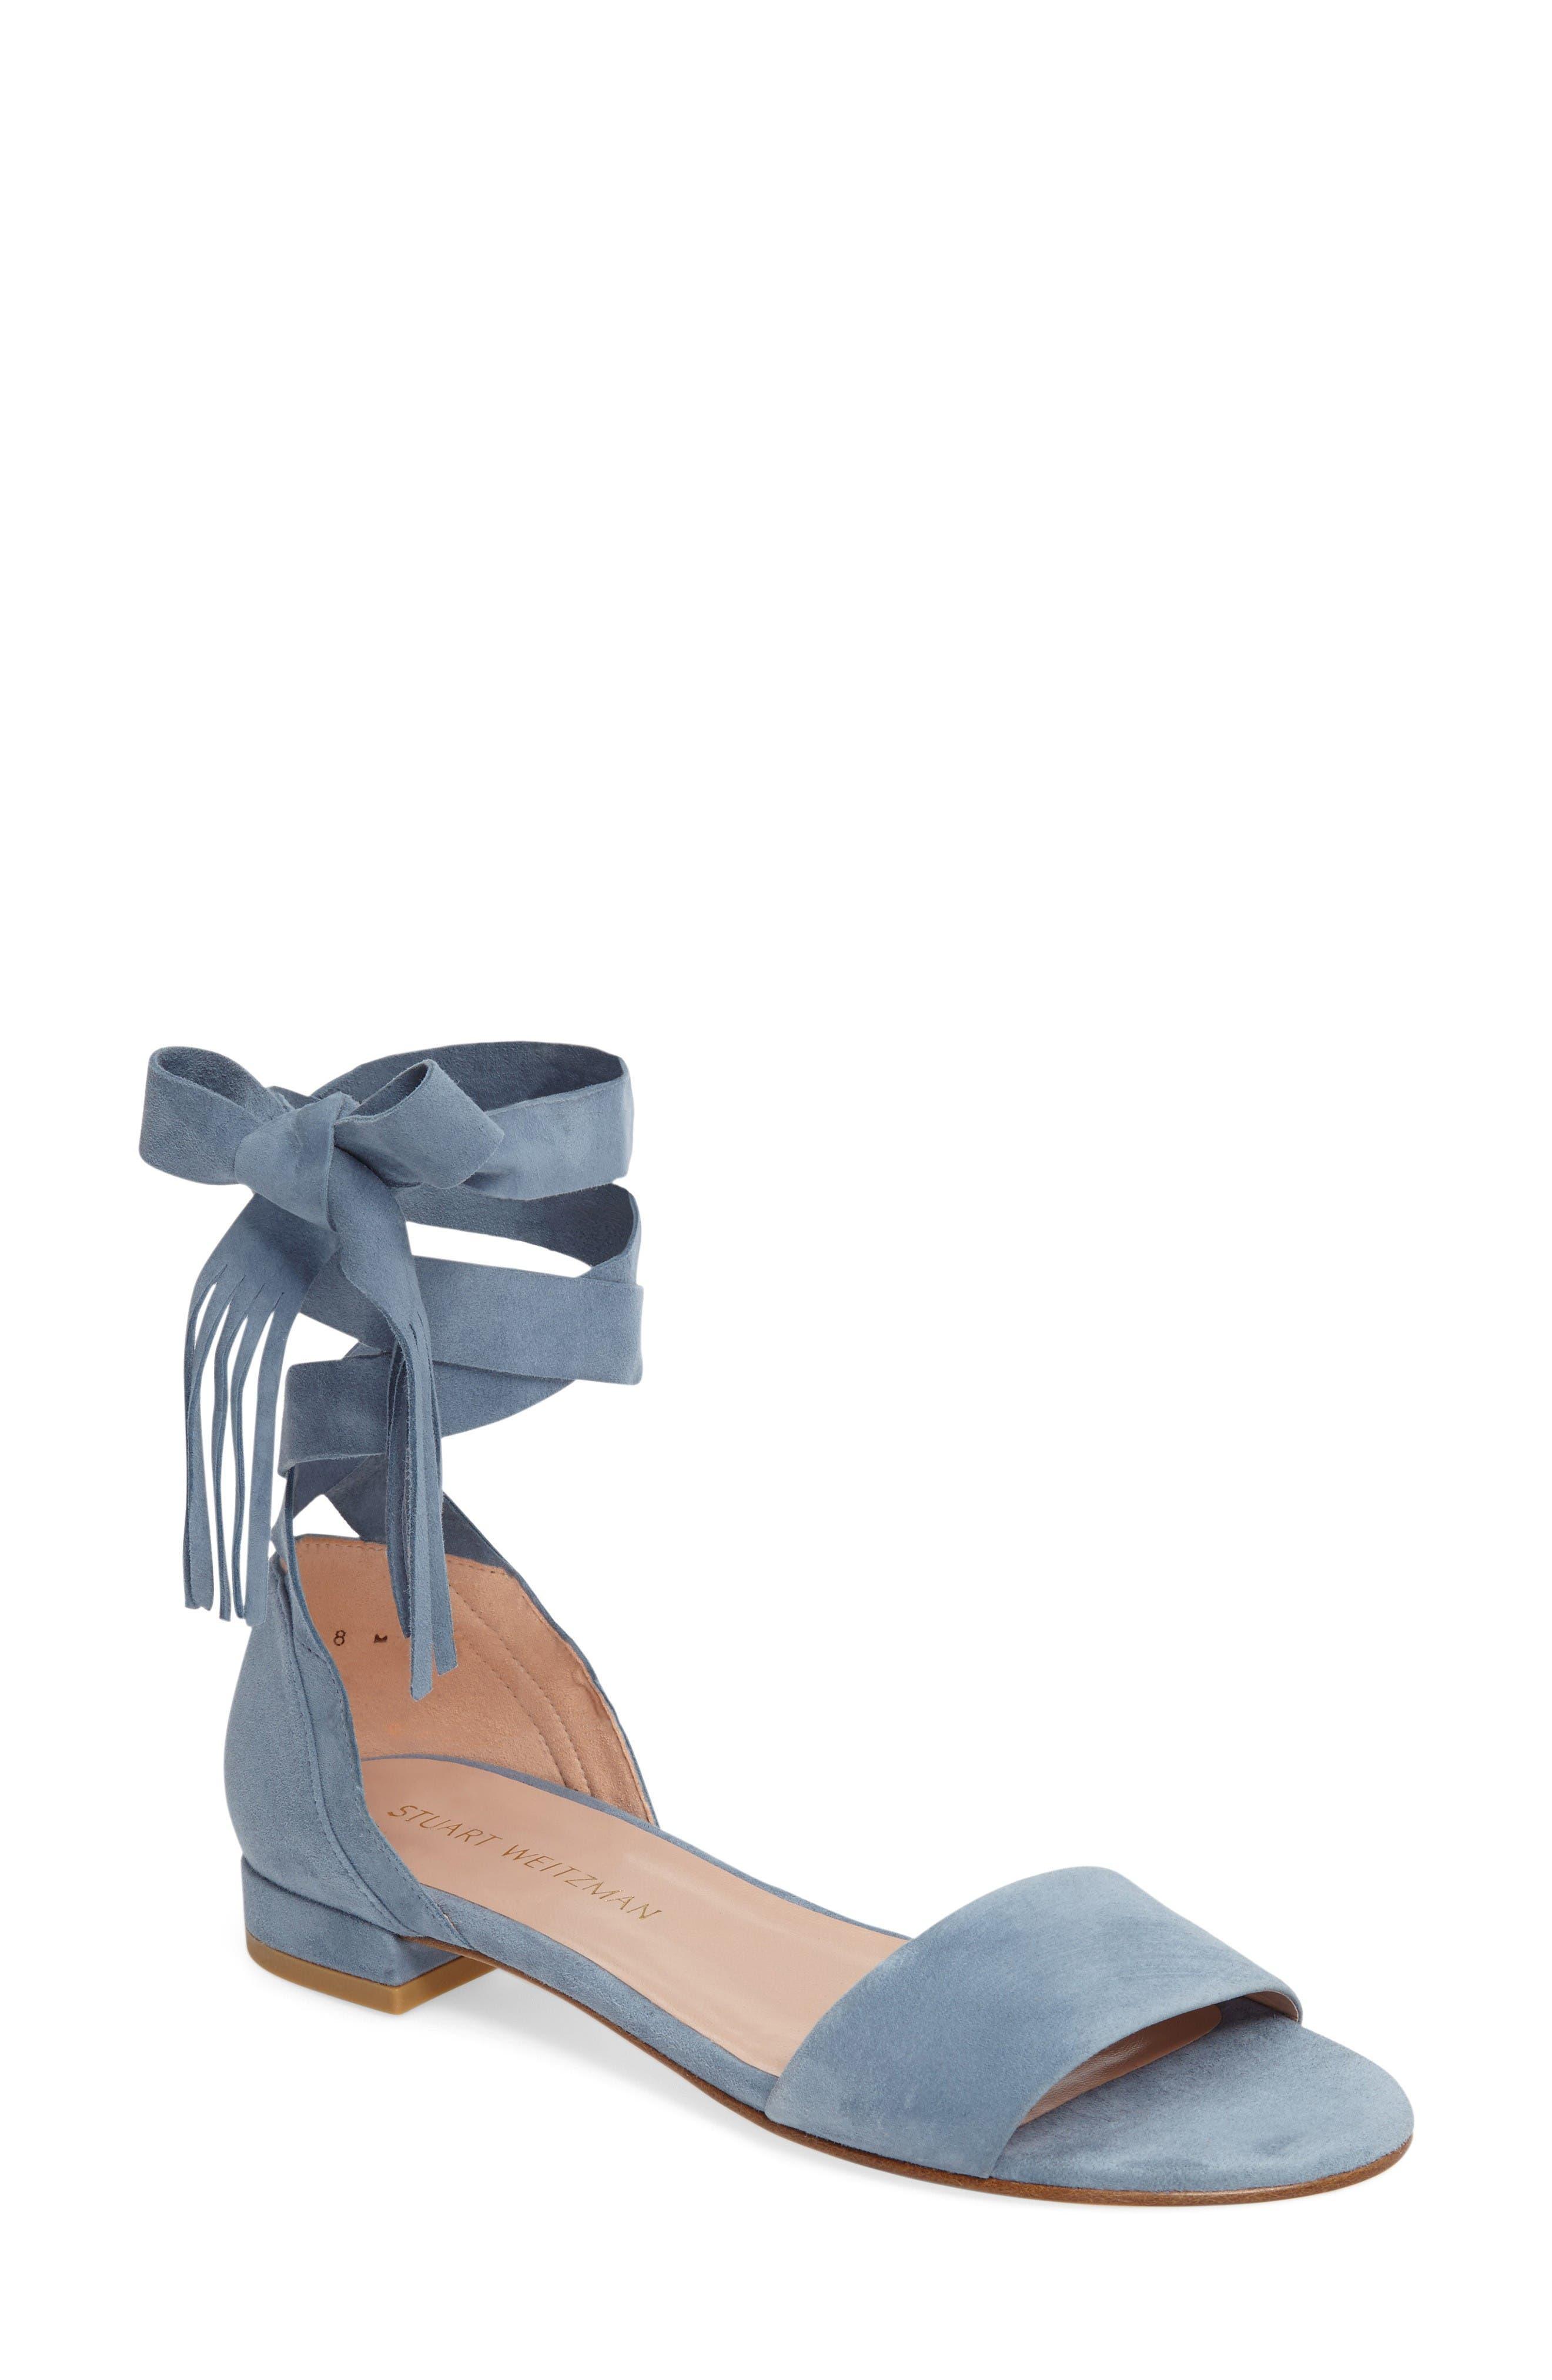 Alternate Image 1 Selected - Stuart Weitzman Corbata Sandal (Women)